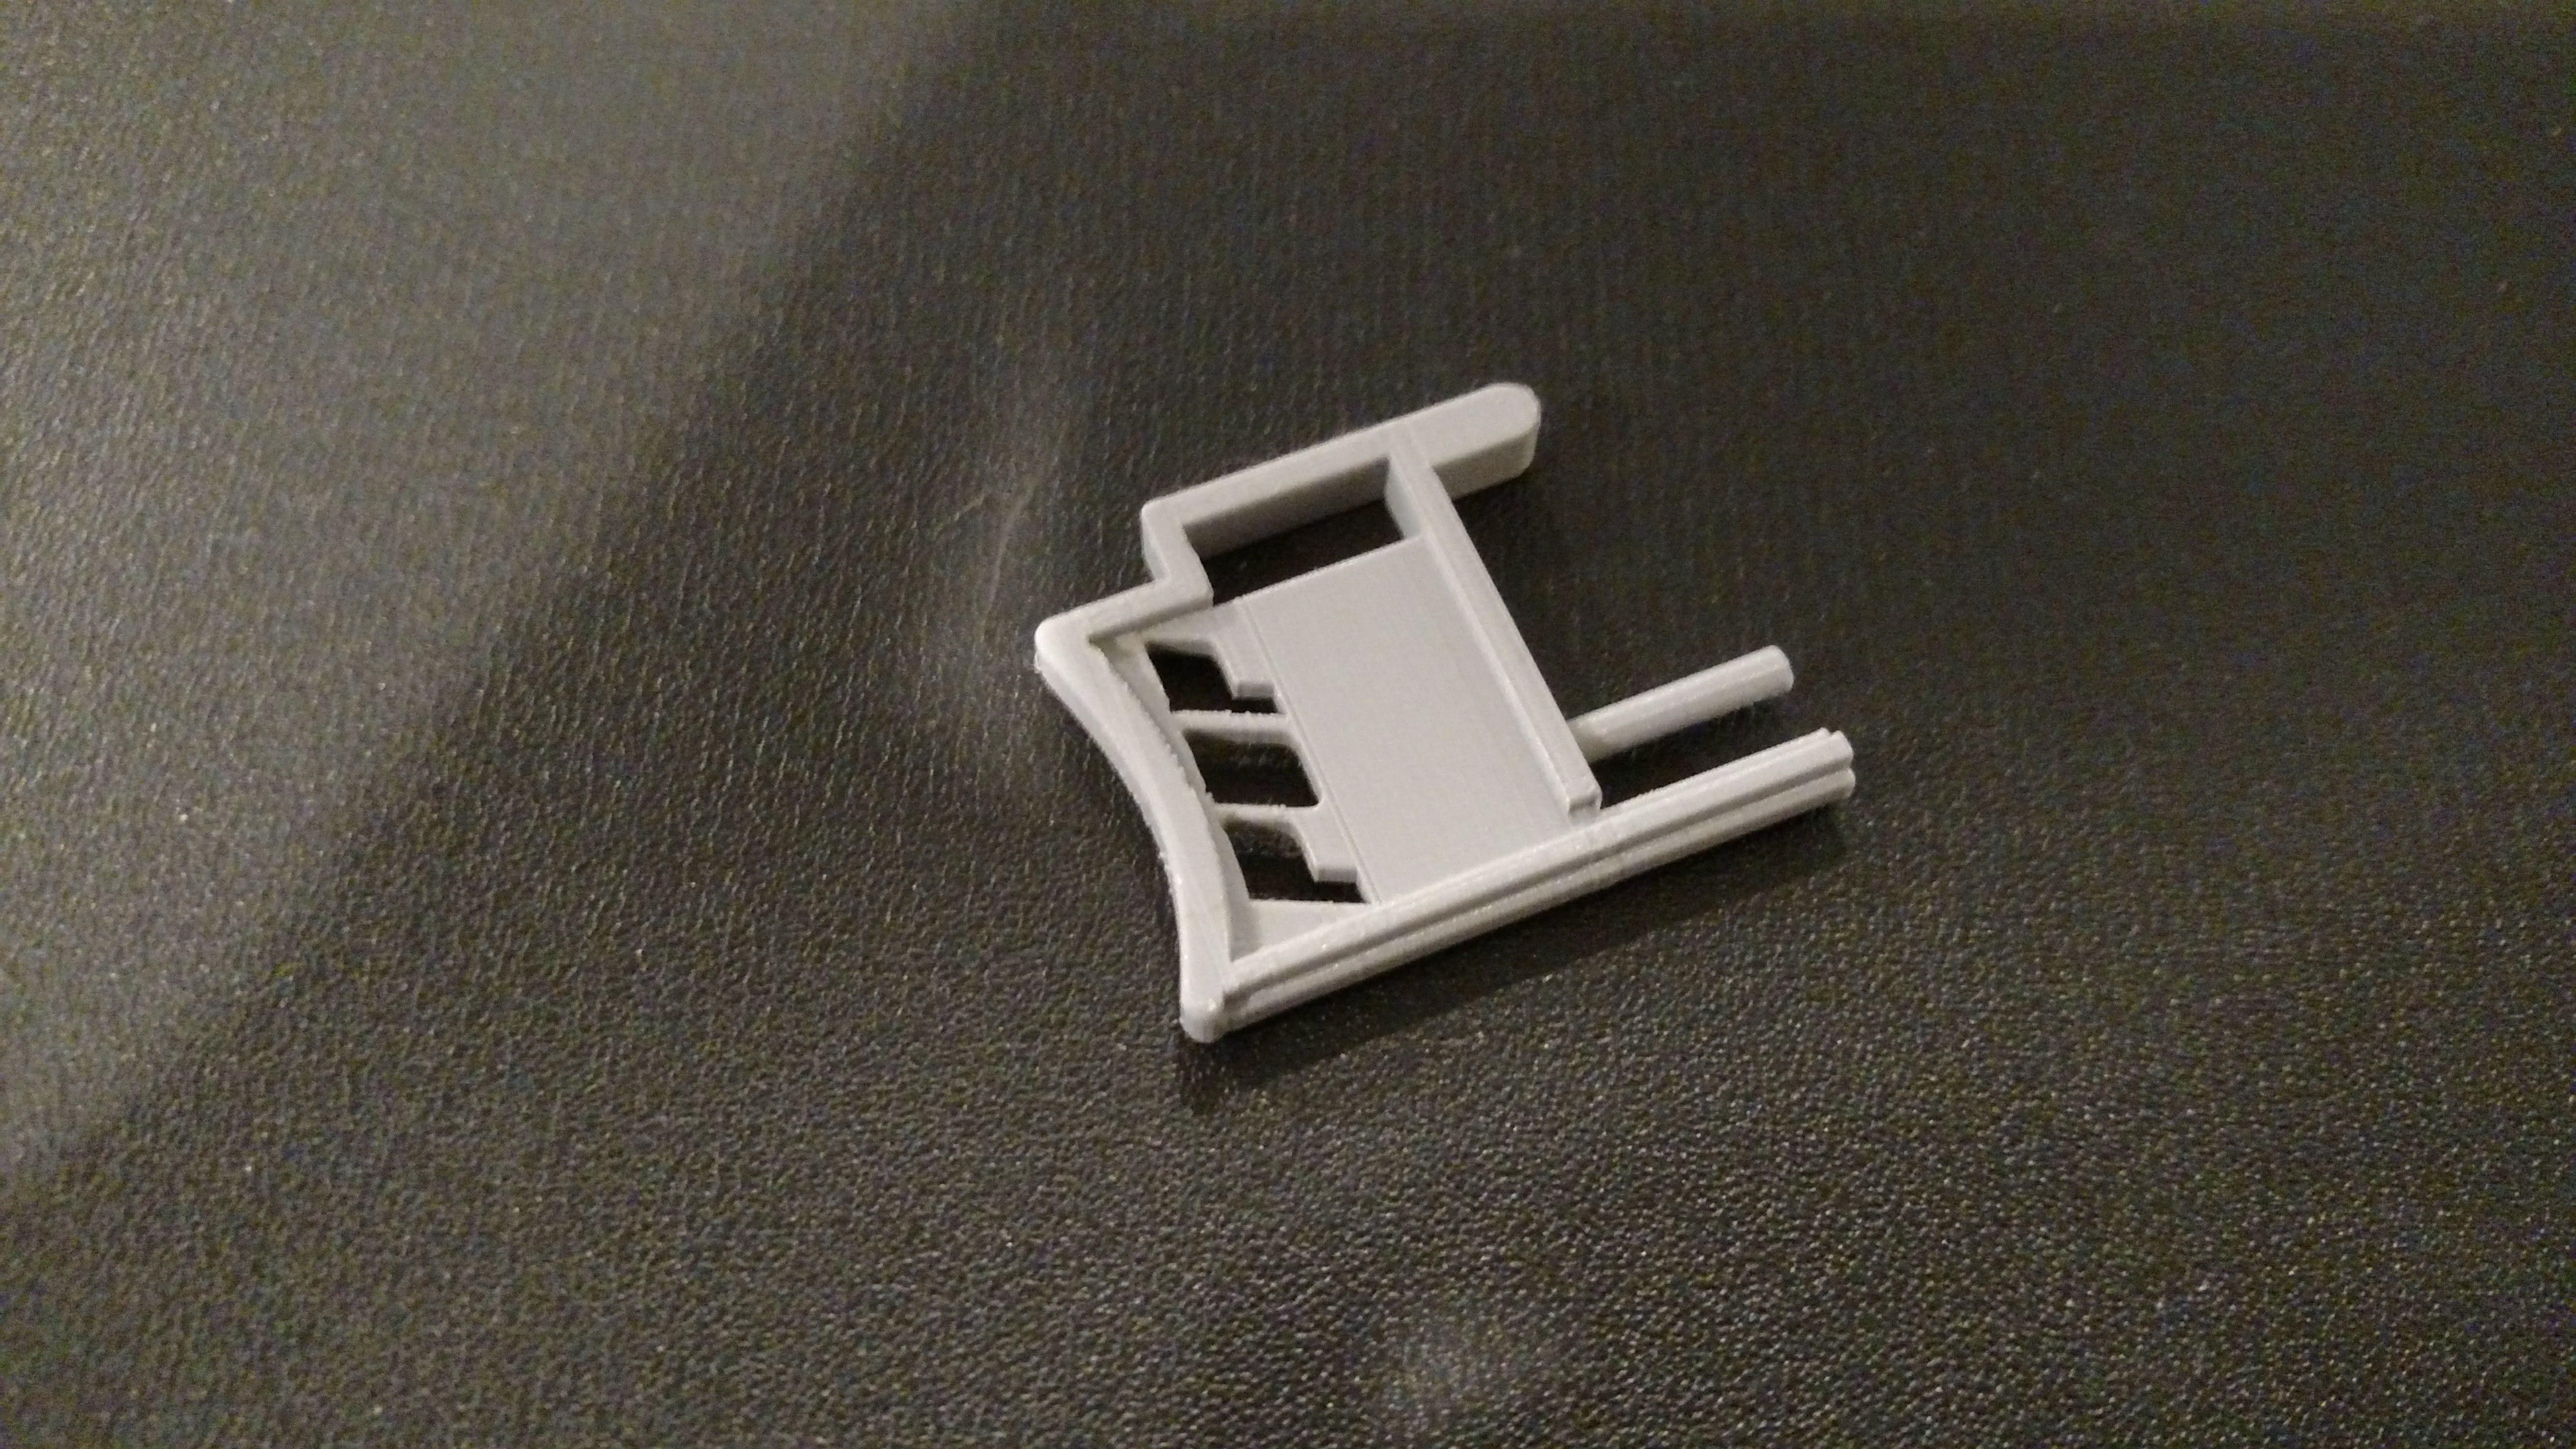 IMG_20181202_111846538.jpg Download free STL file Nerf Lock n' Load Trigger • 3D printable template, popatachi